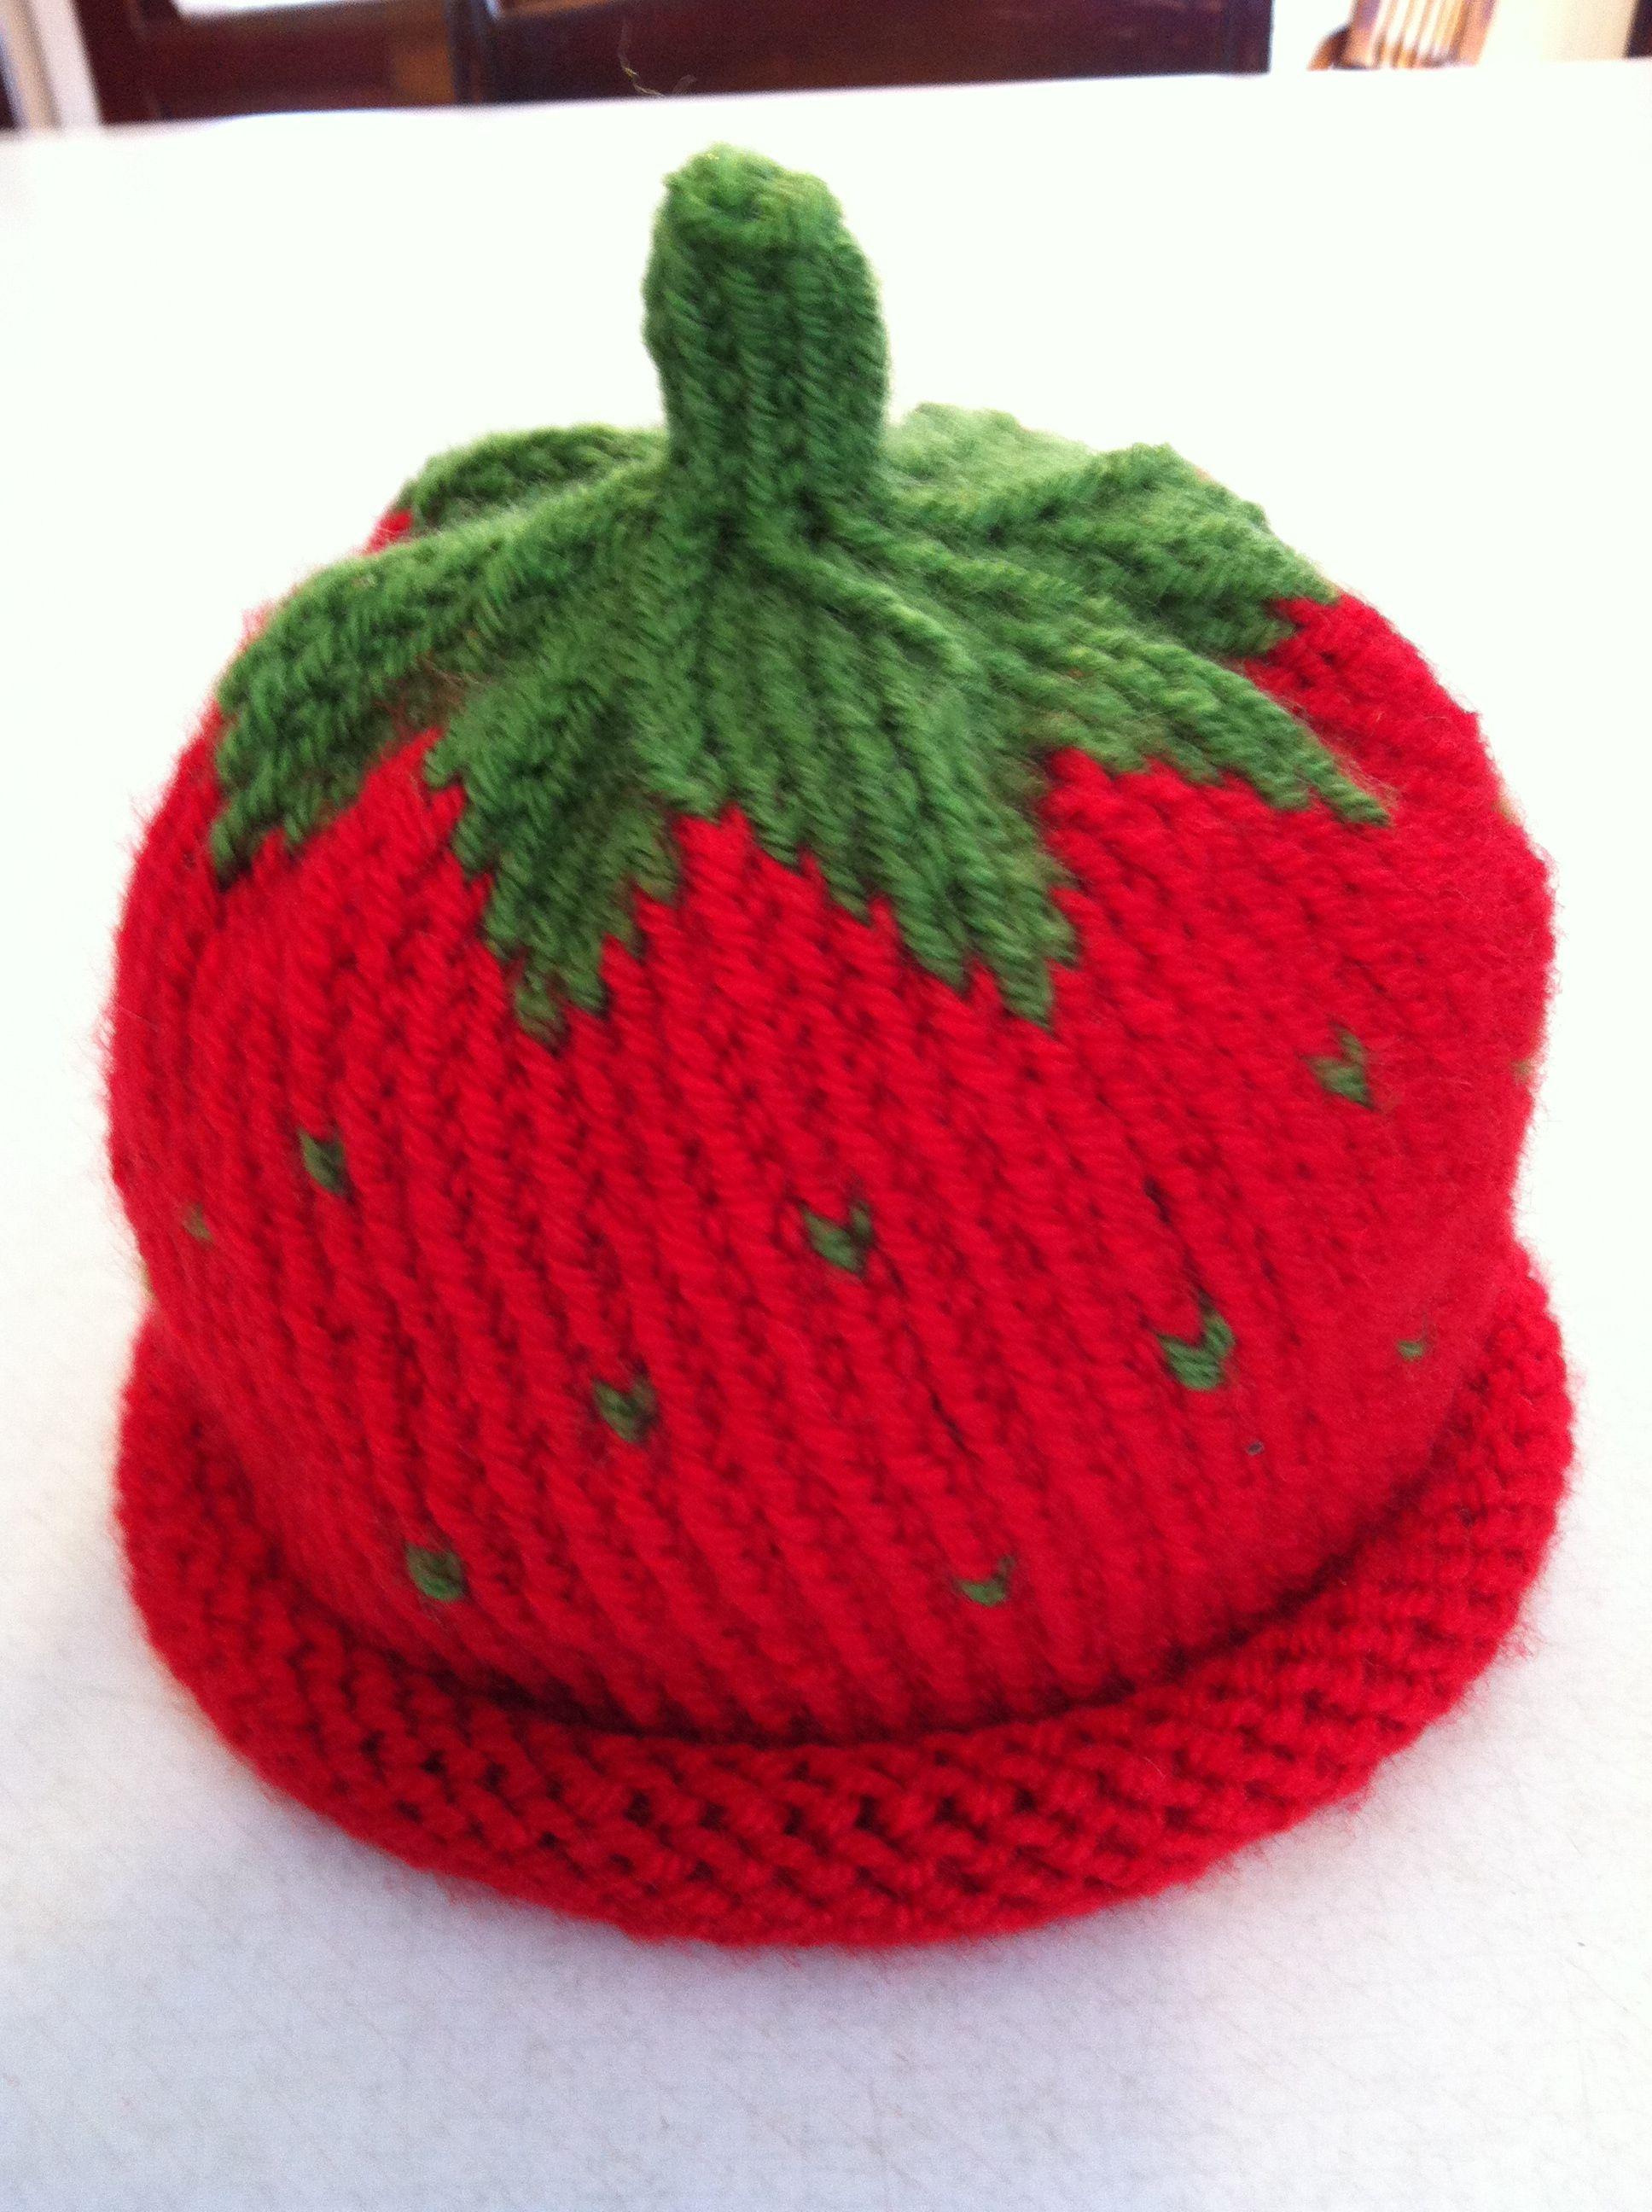 Knitting Pattern For Strawberry Hat : Strawberry Baby Hat Knit/crochet Pinterest